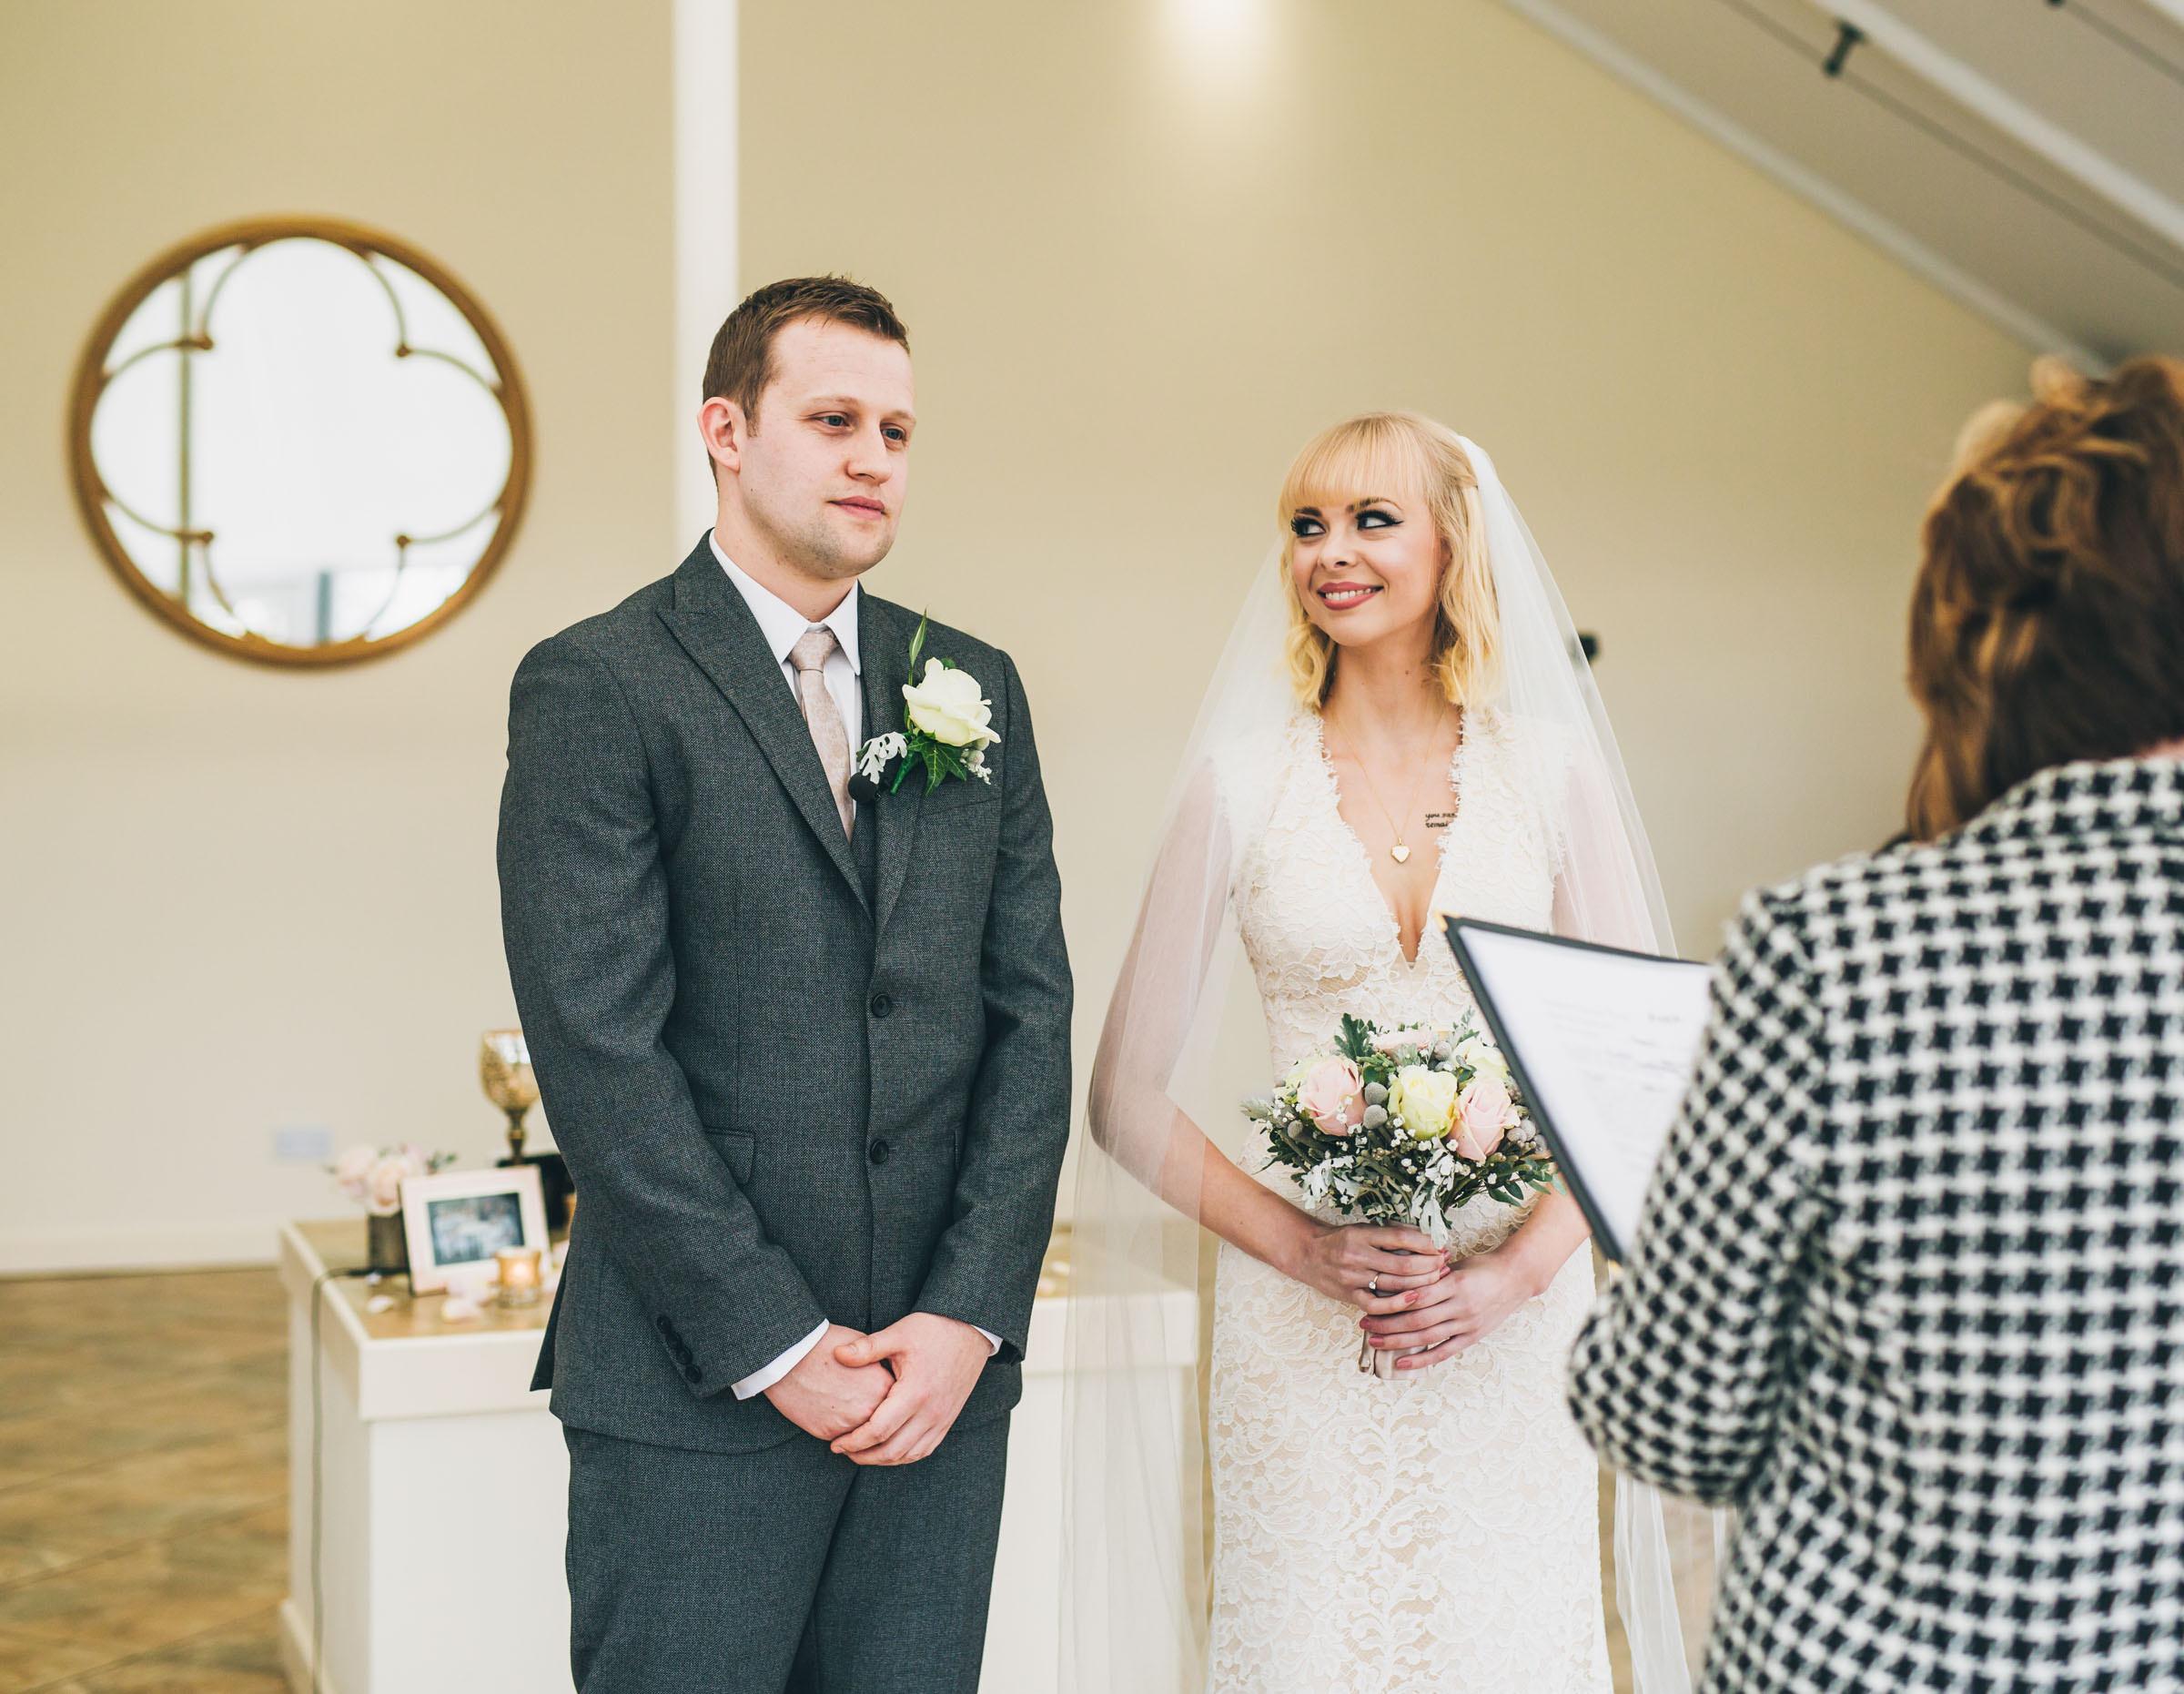 Documentary wedding photographer North West - wedding ceremony